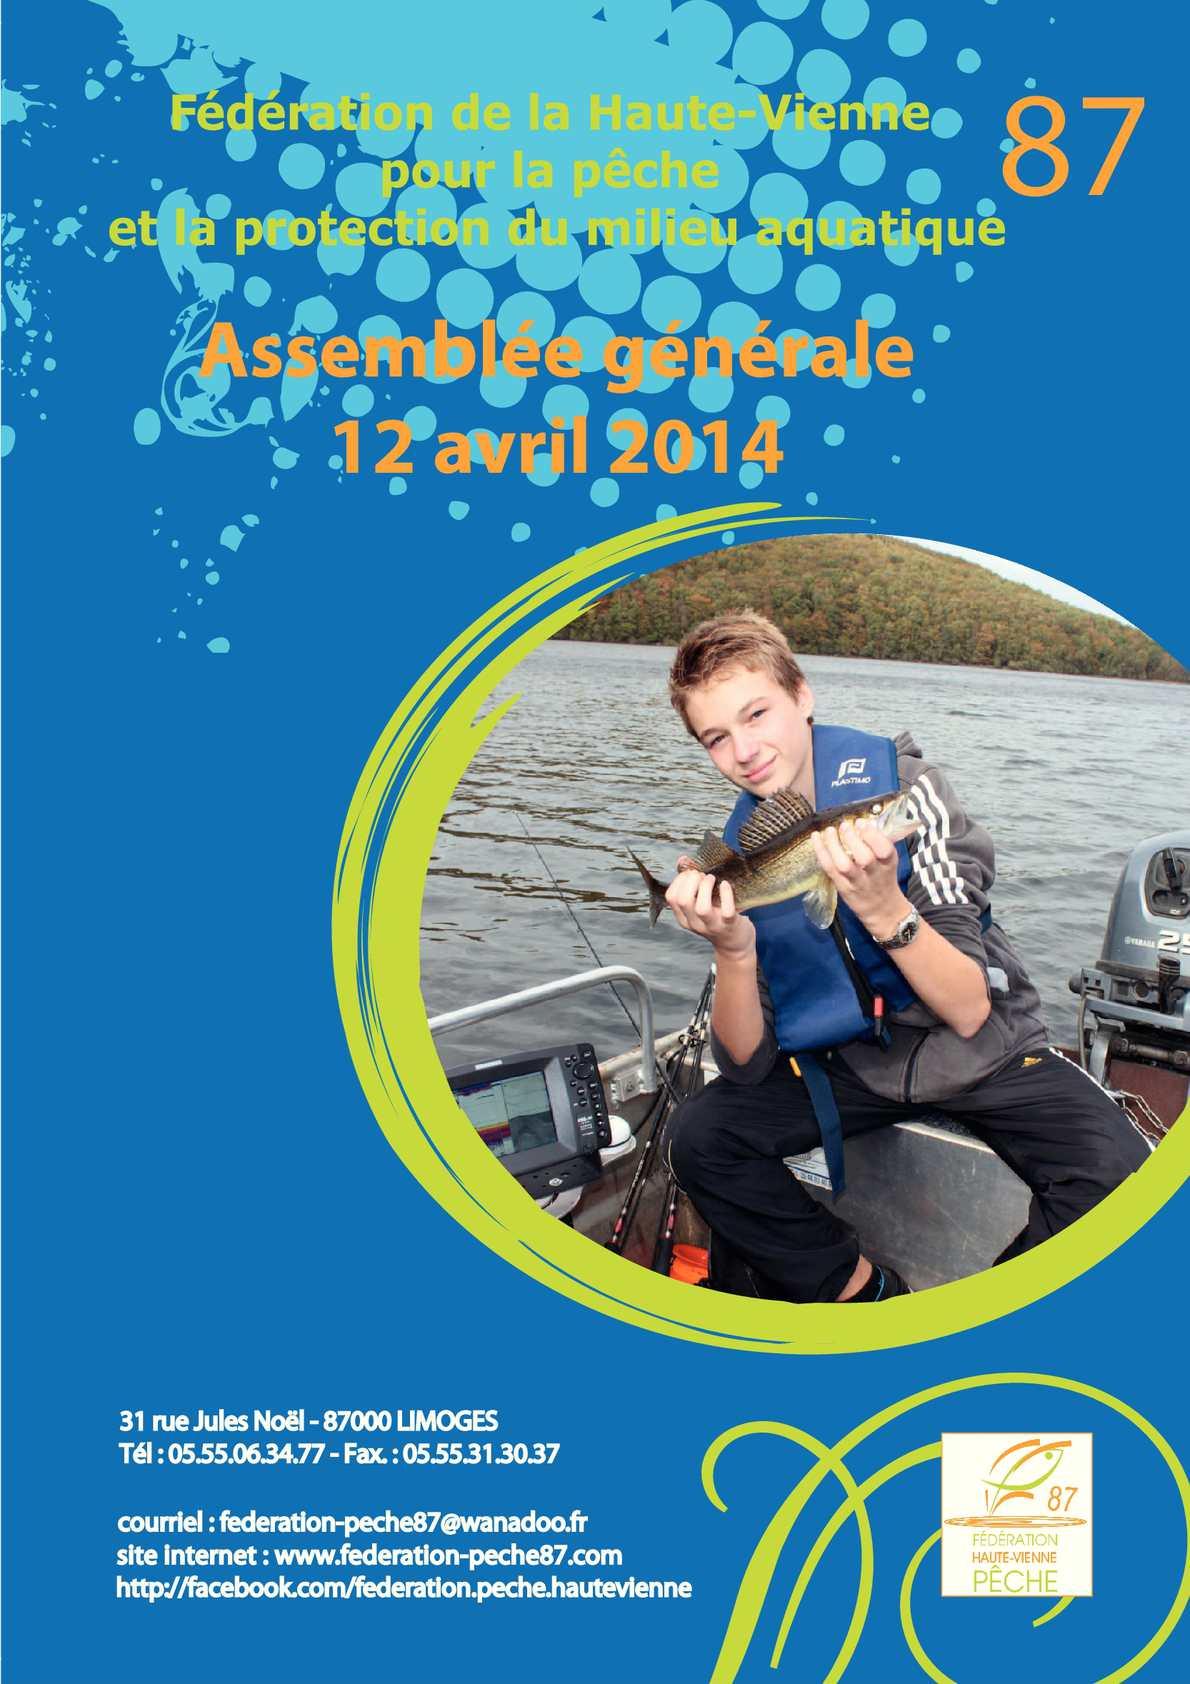 Calam o bilan d 39 activit s f d rales 2013 - Chambre d agriculture haute vienne ...